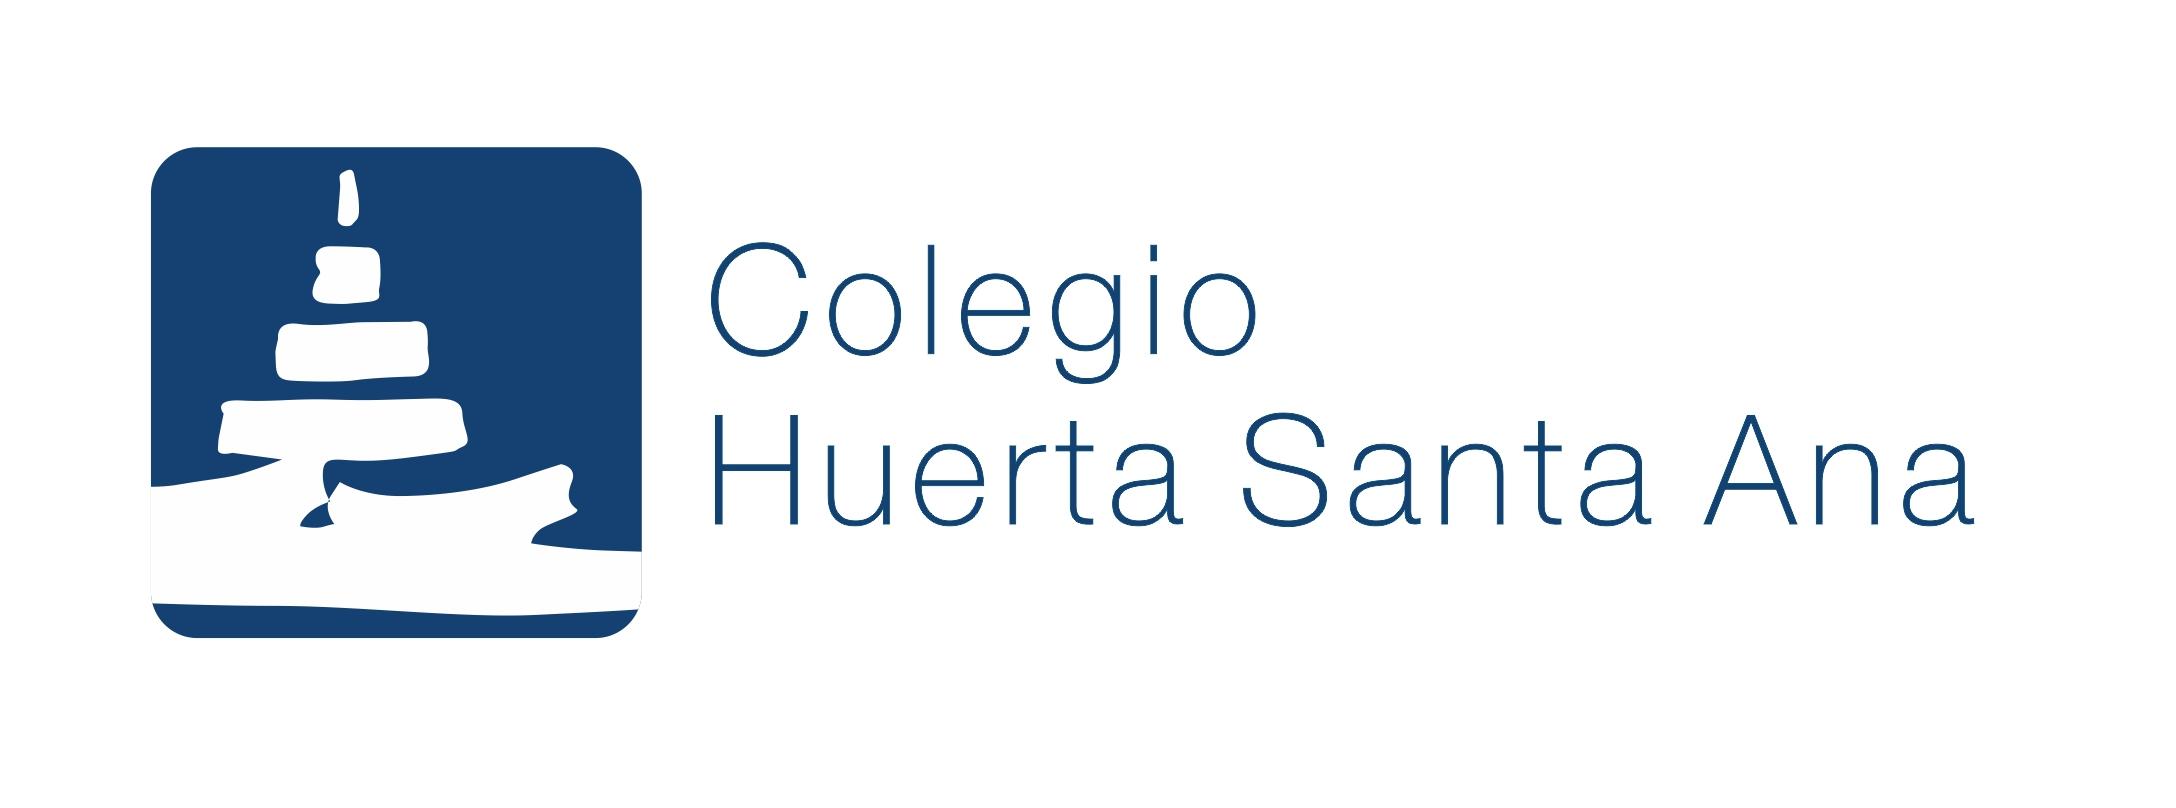 Colegio Huerta de Santa Ana